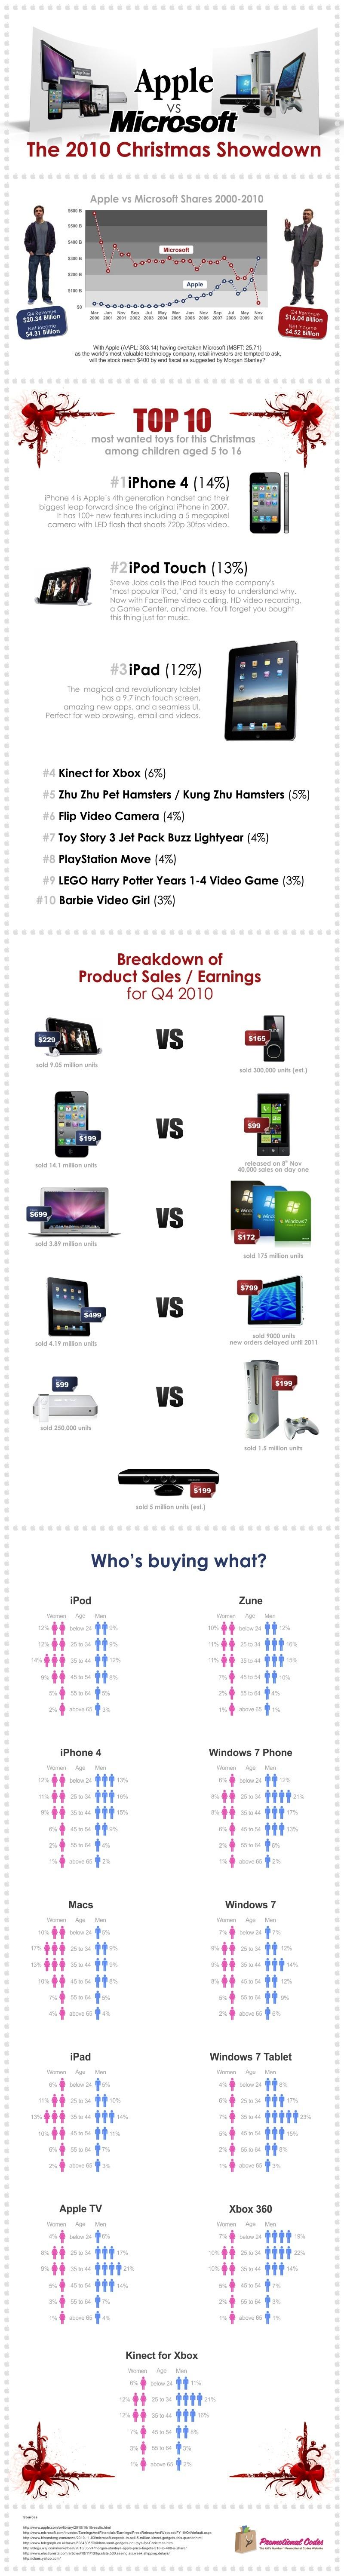 Infographie : Noël 2010 - Apple versus Microsoft